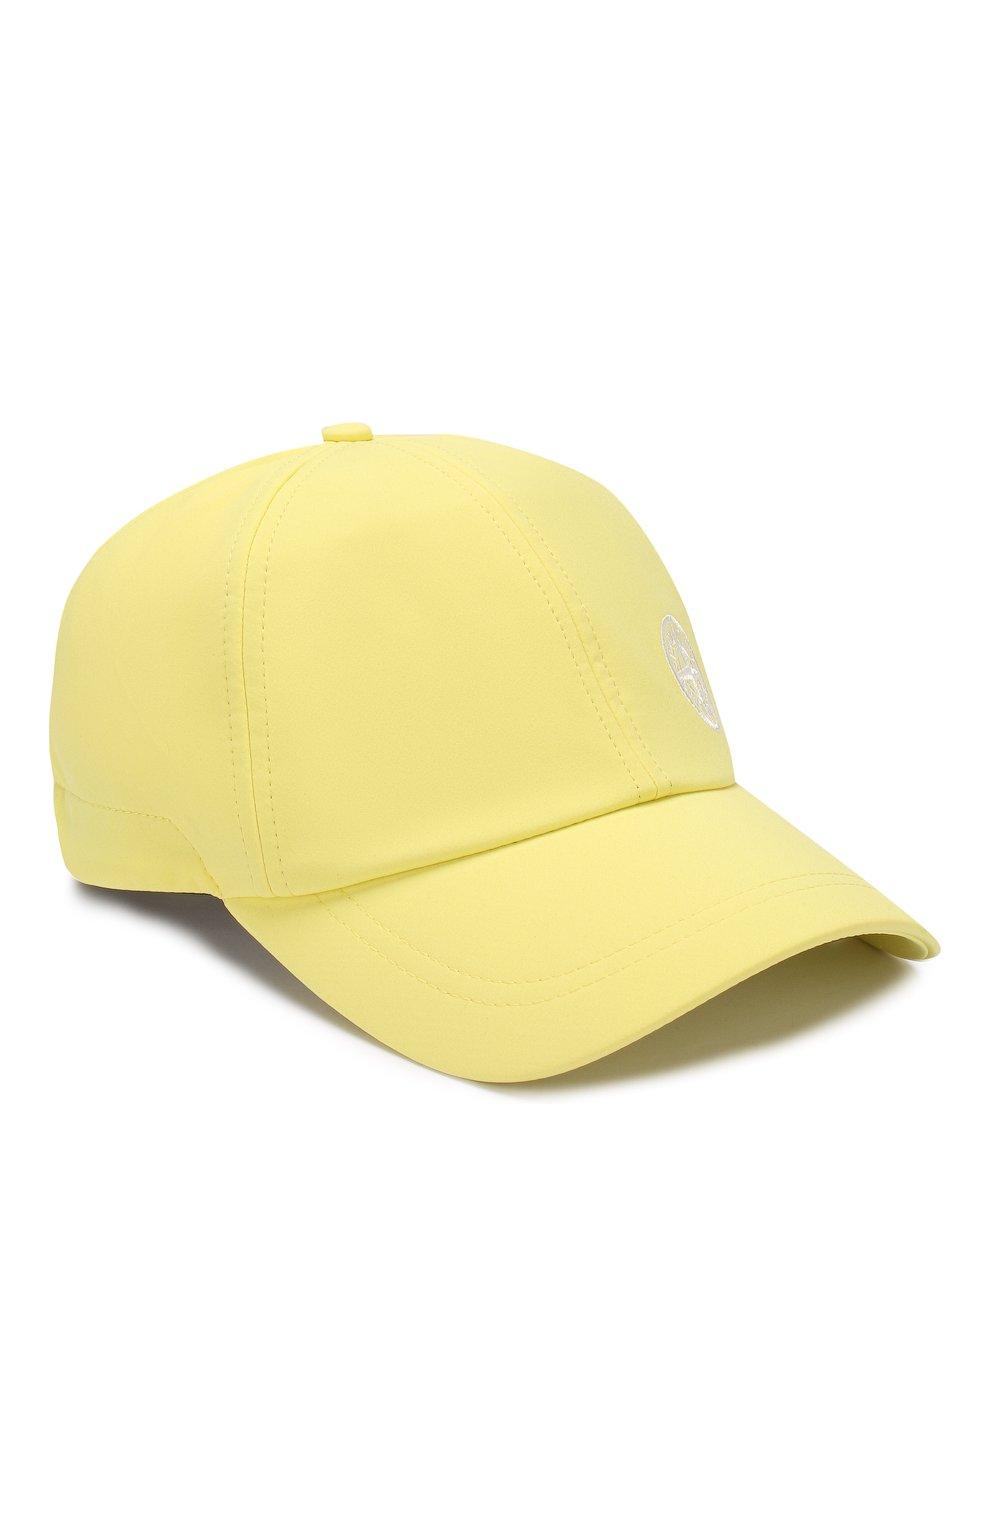 Мужской бейсболка STONE ISLAND желтого цвета, арт. 721599227 | Фото 1